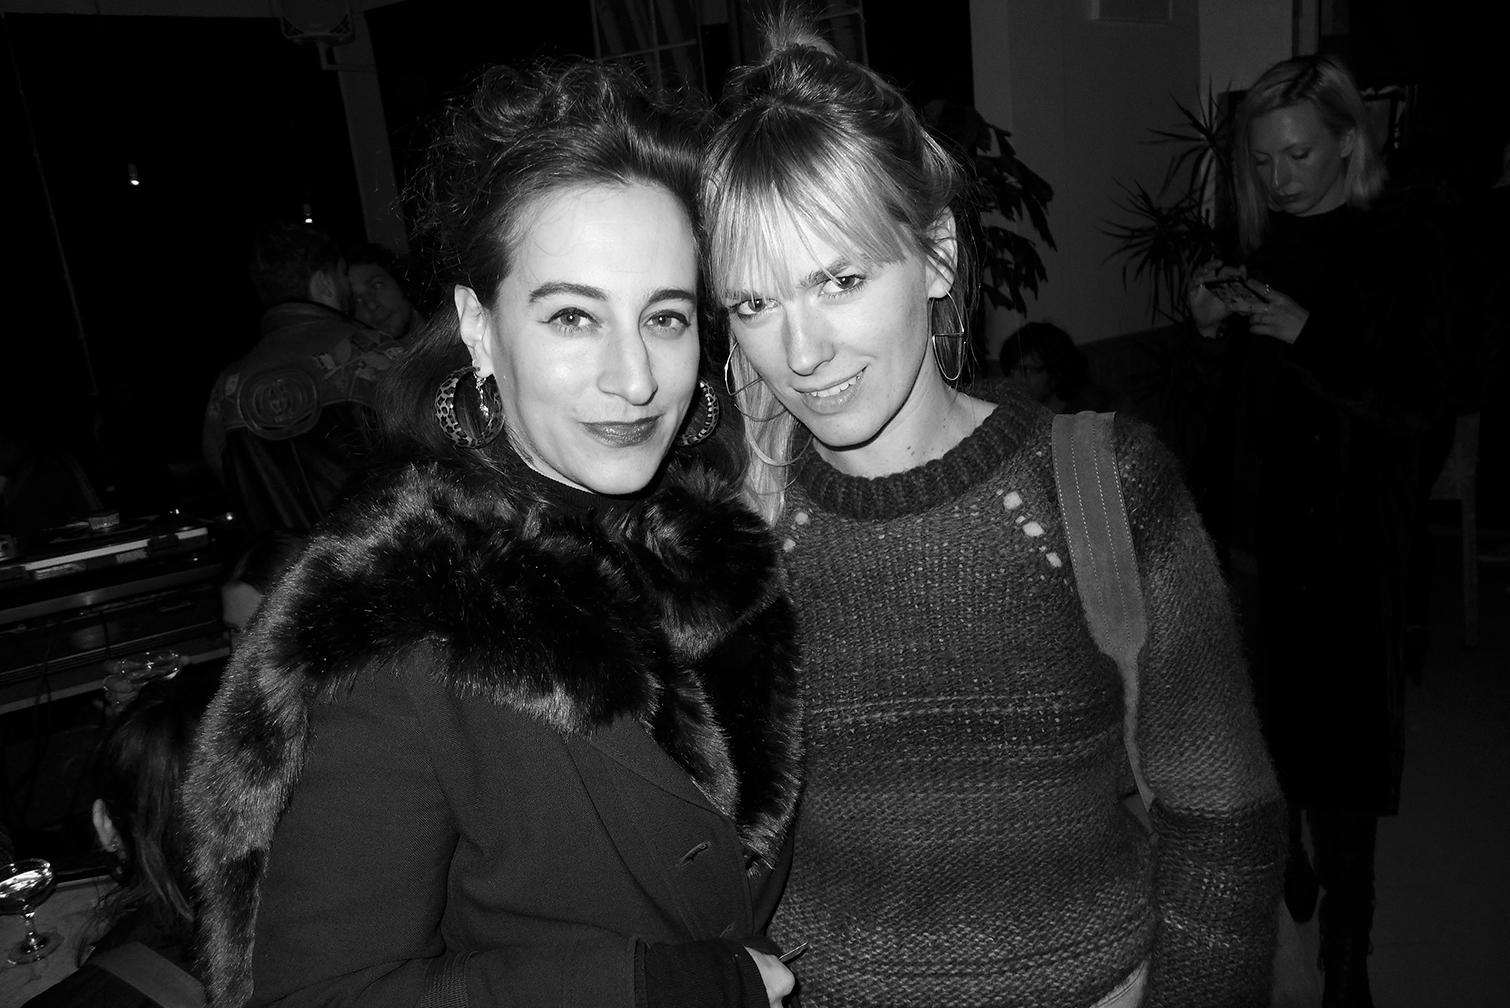 Katherina Olschbaur And A Friend